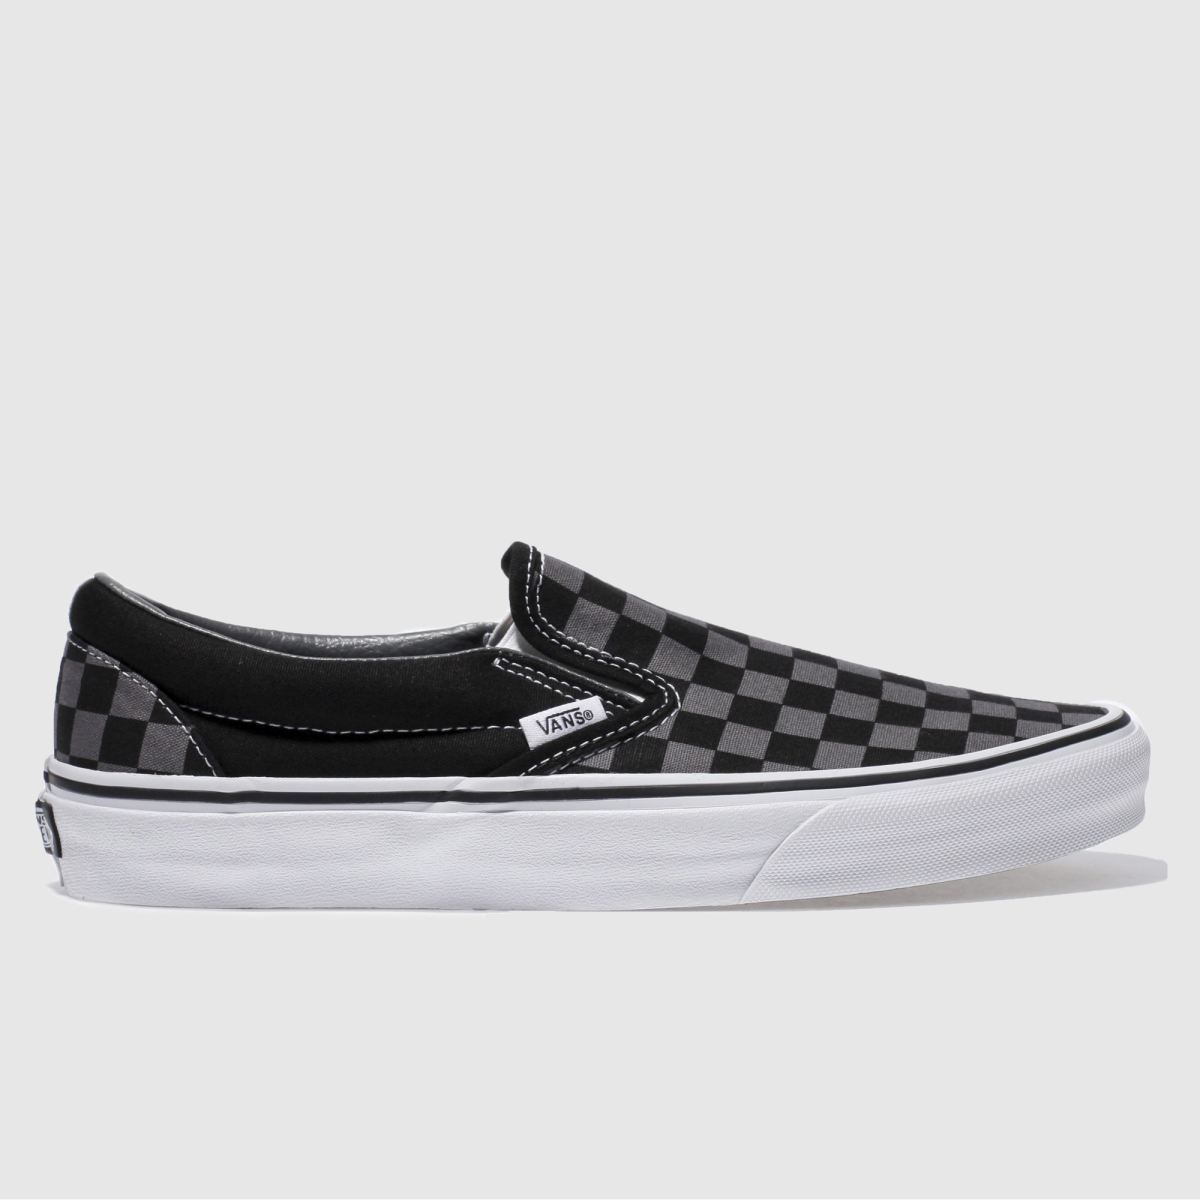 Vans Black & Grey Classic Slip On Trainers